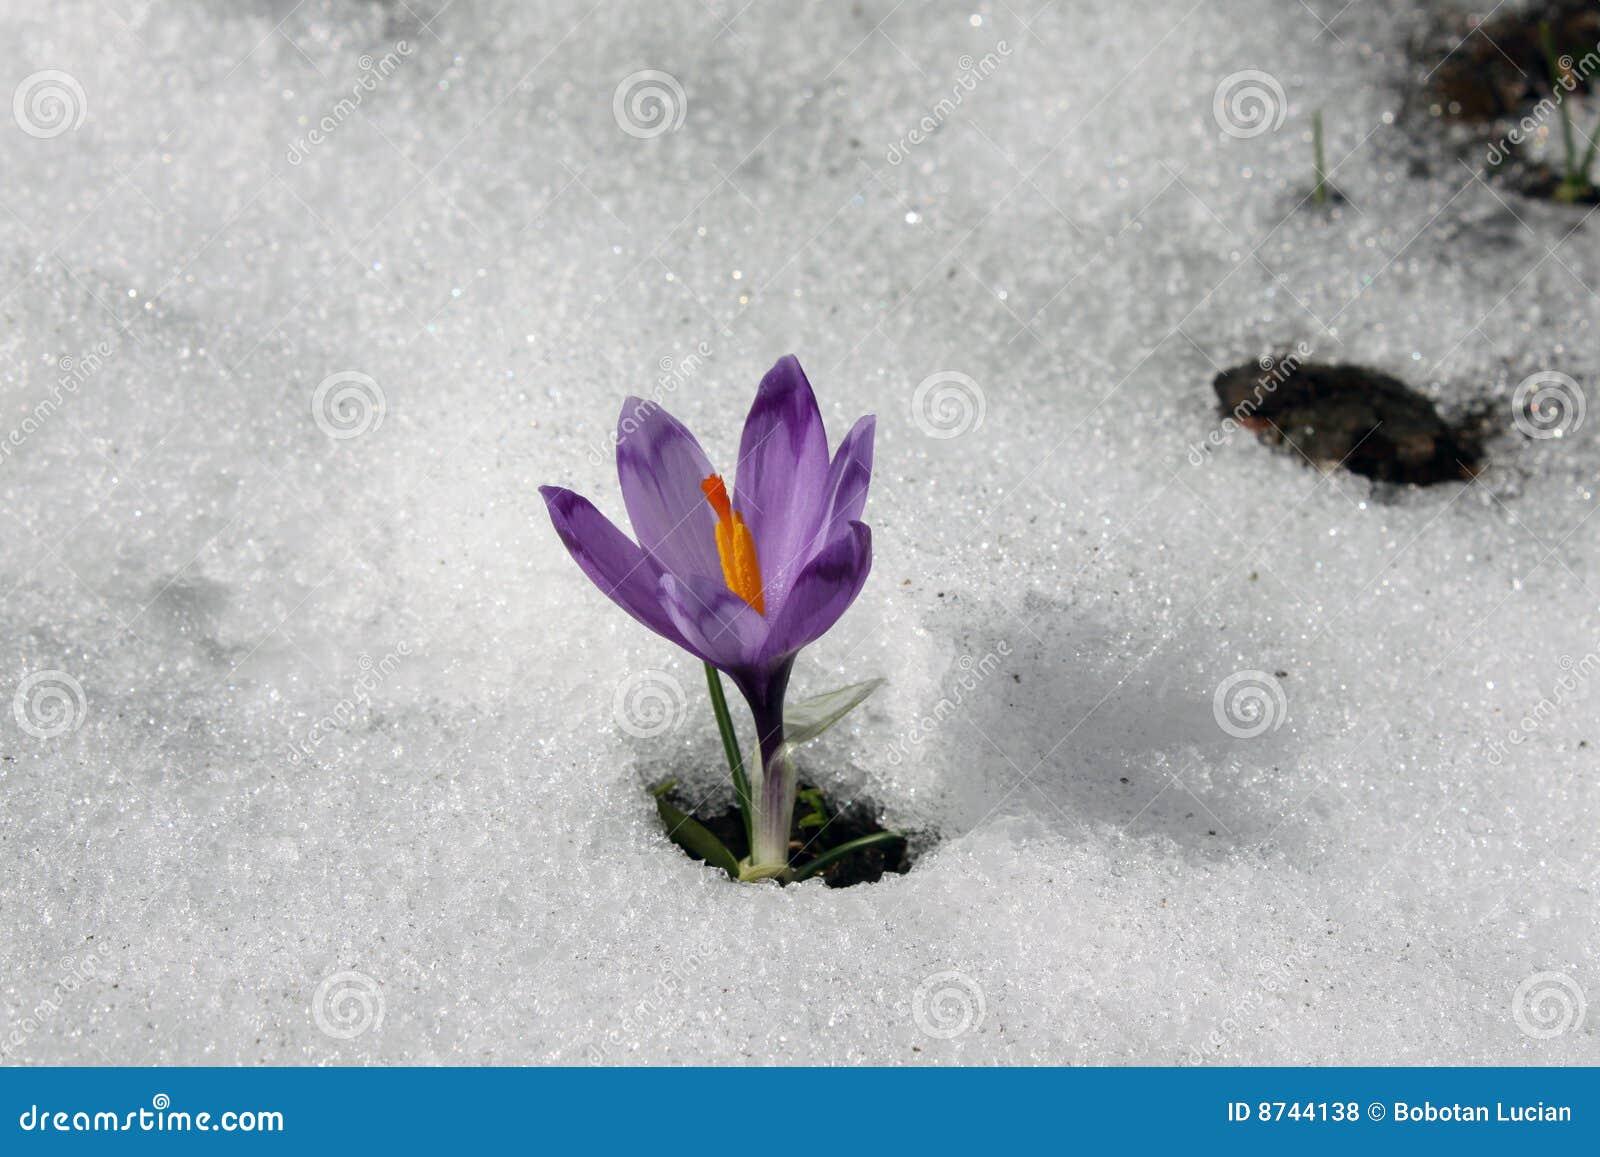 fleur de montagne photo stock image du neige montagne 8744138. Black Bedroom Furniture Sets. Home Design Ideas